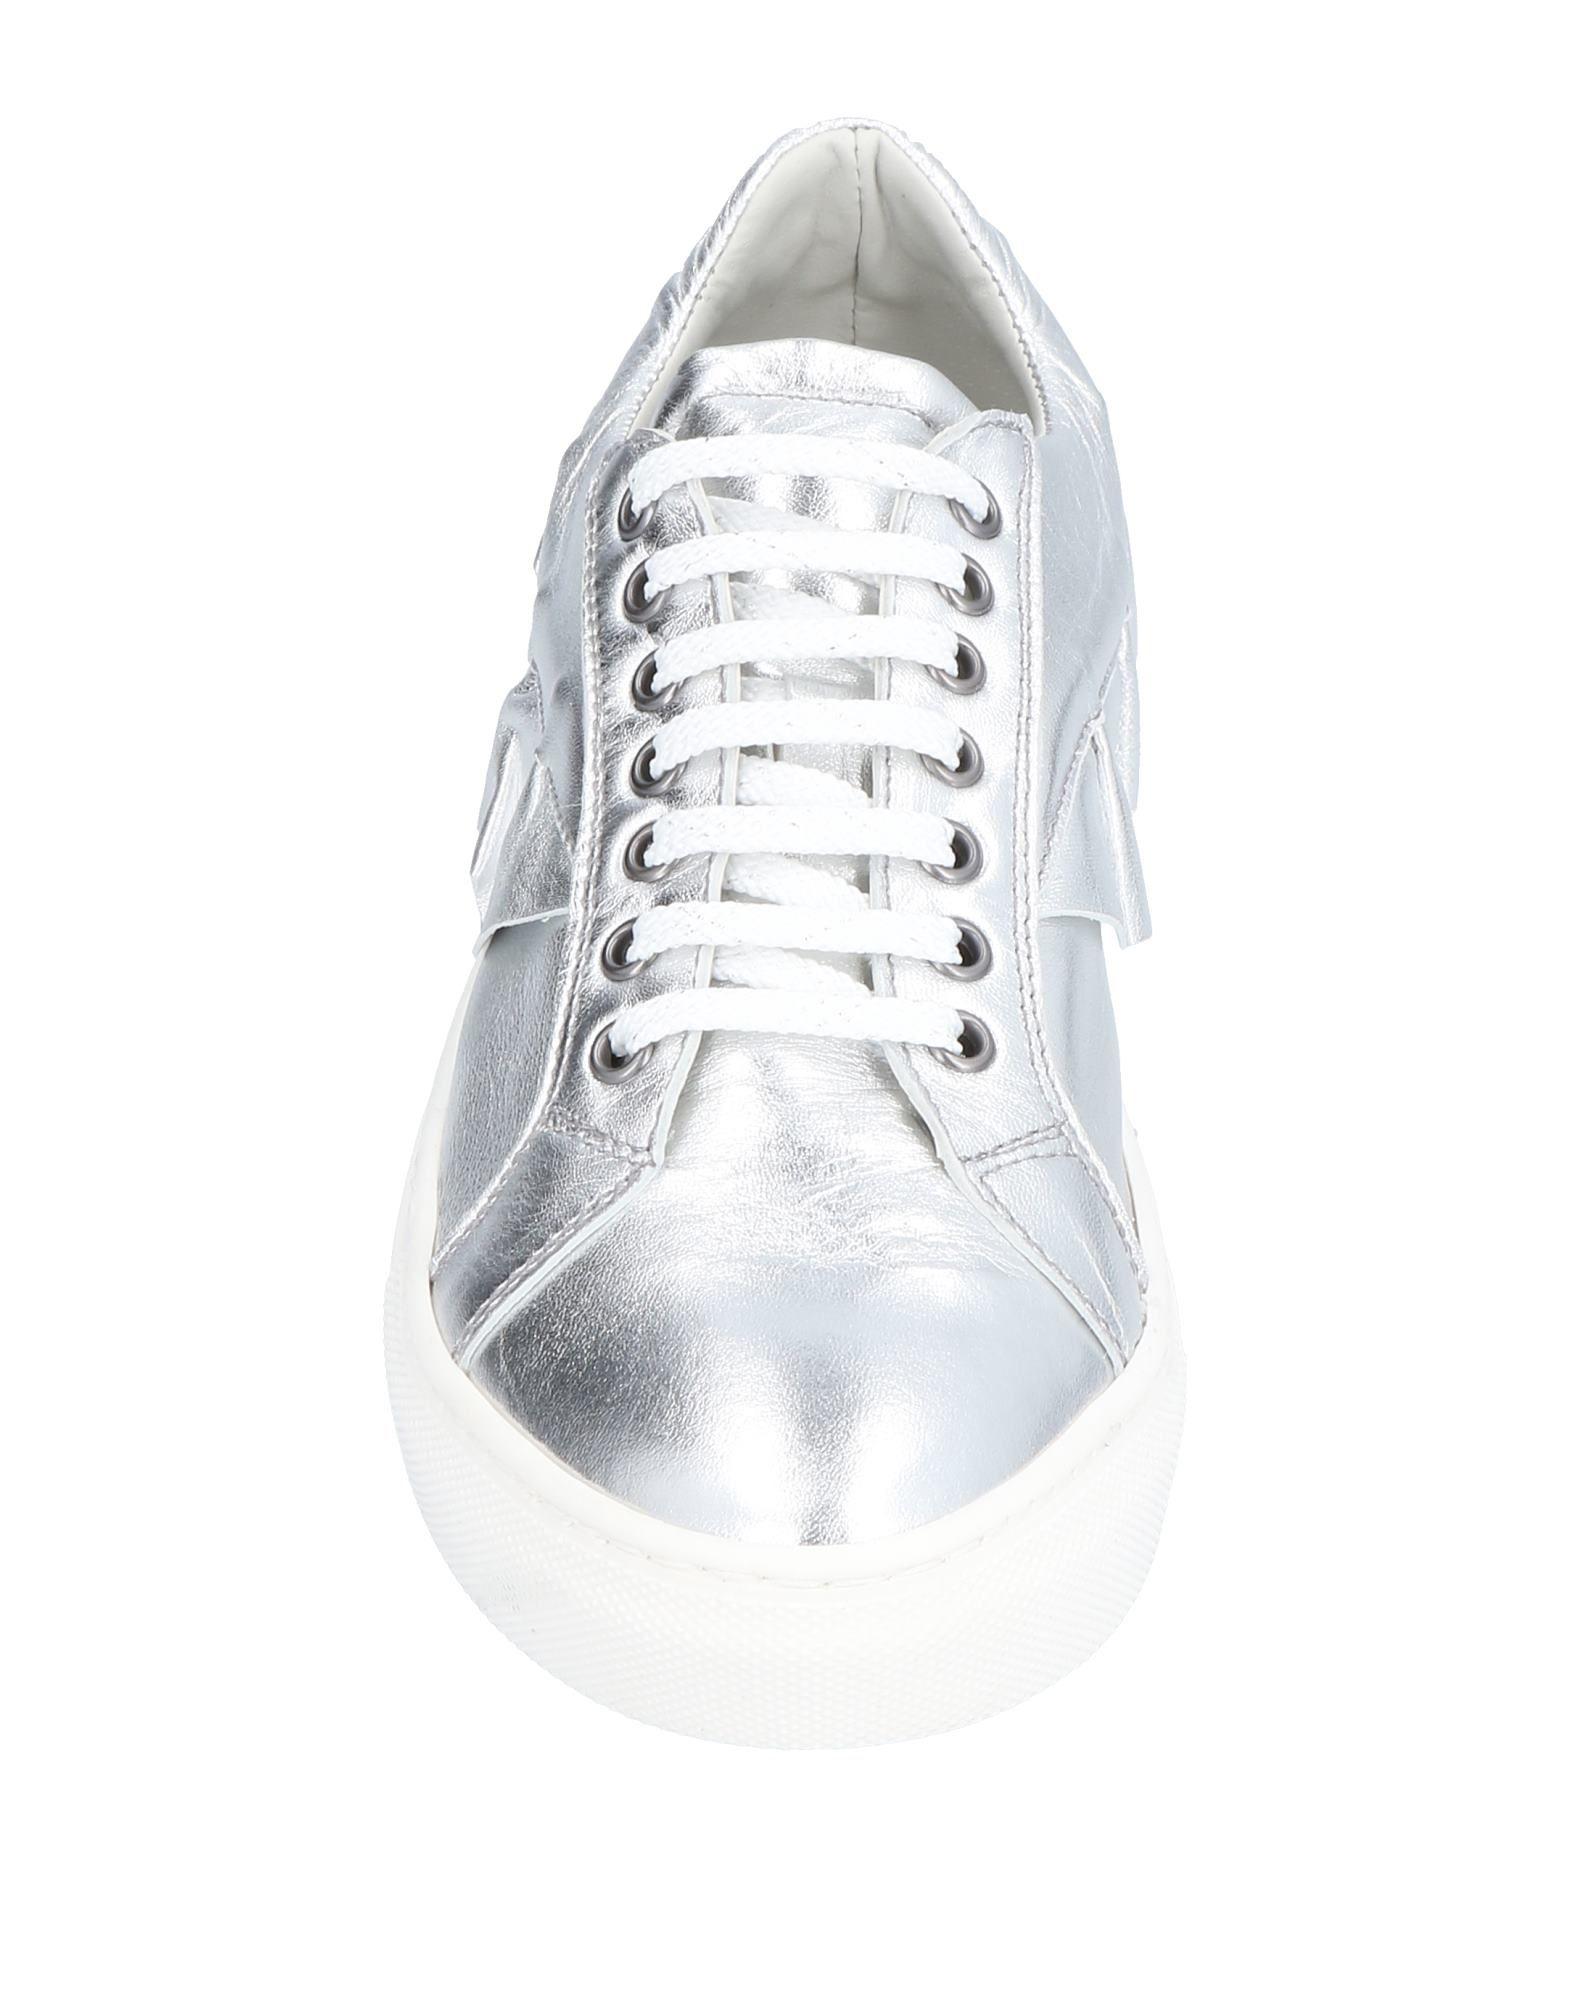 Islo Isabella Lorusso Sneakers Damen  11471320GU 11471320GU  Gute Qualität beliebte Schuhe 51e753